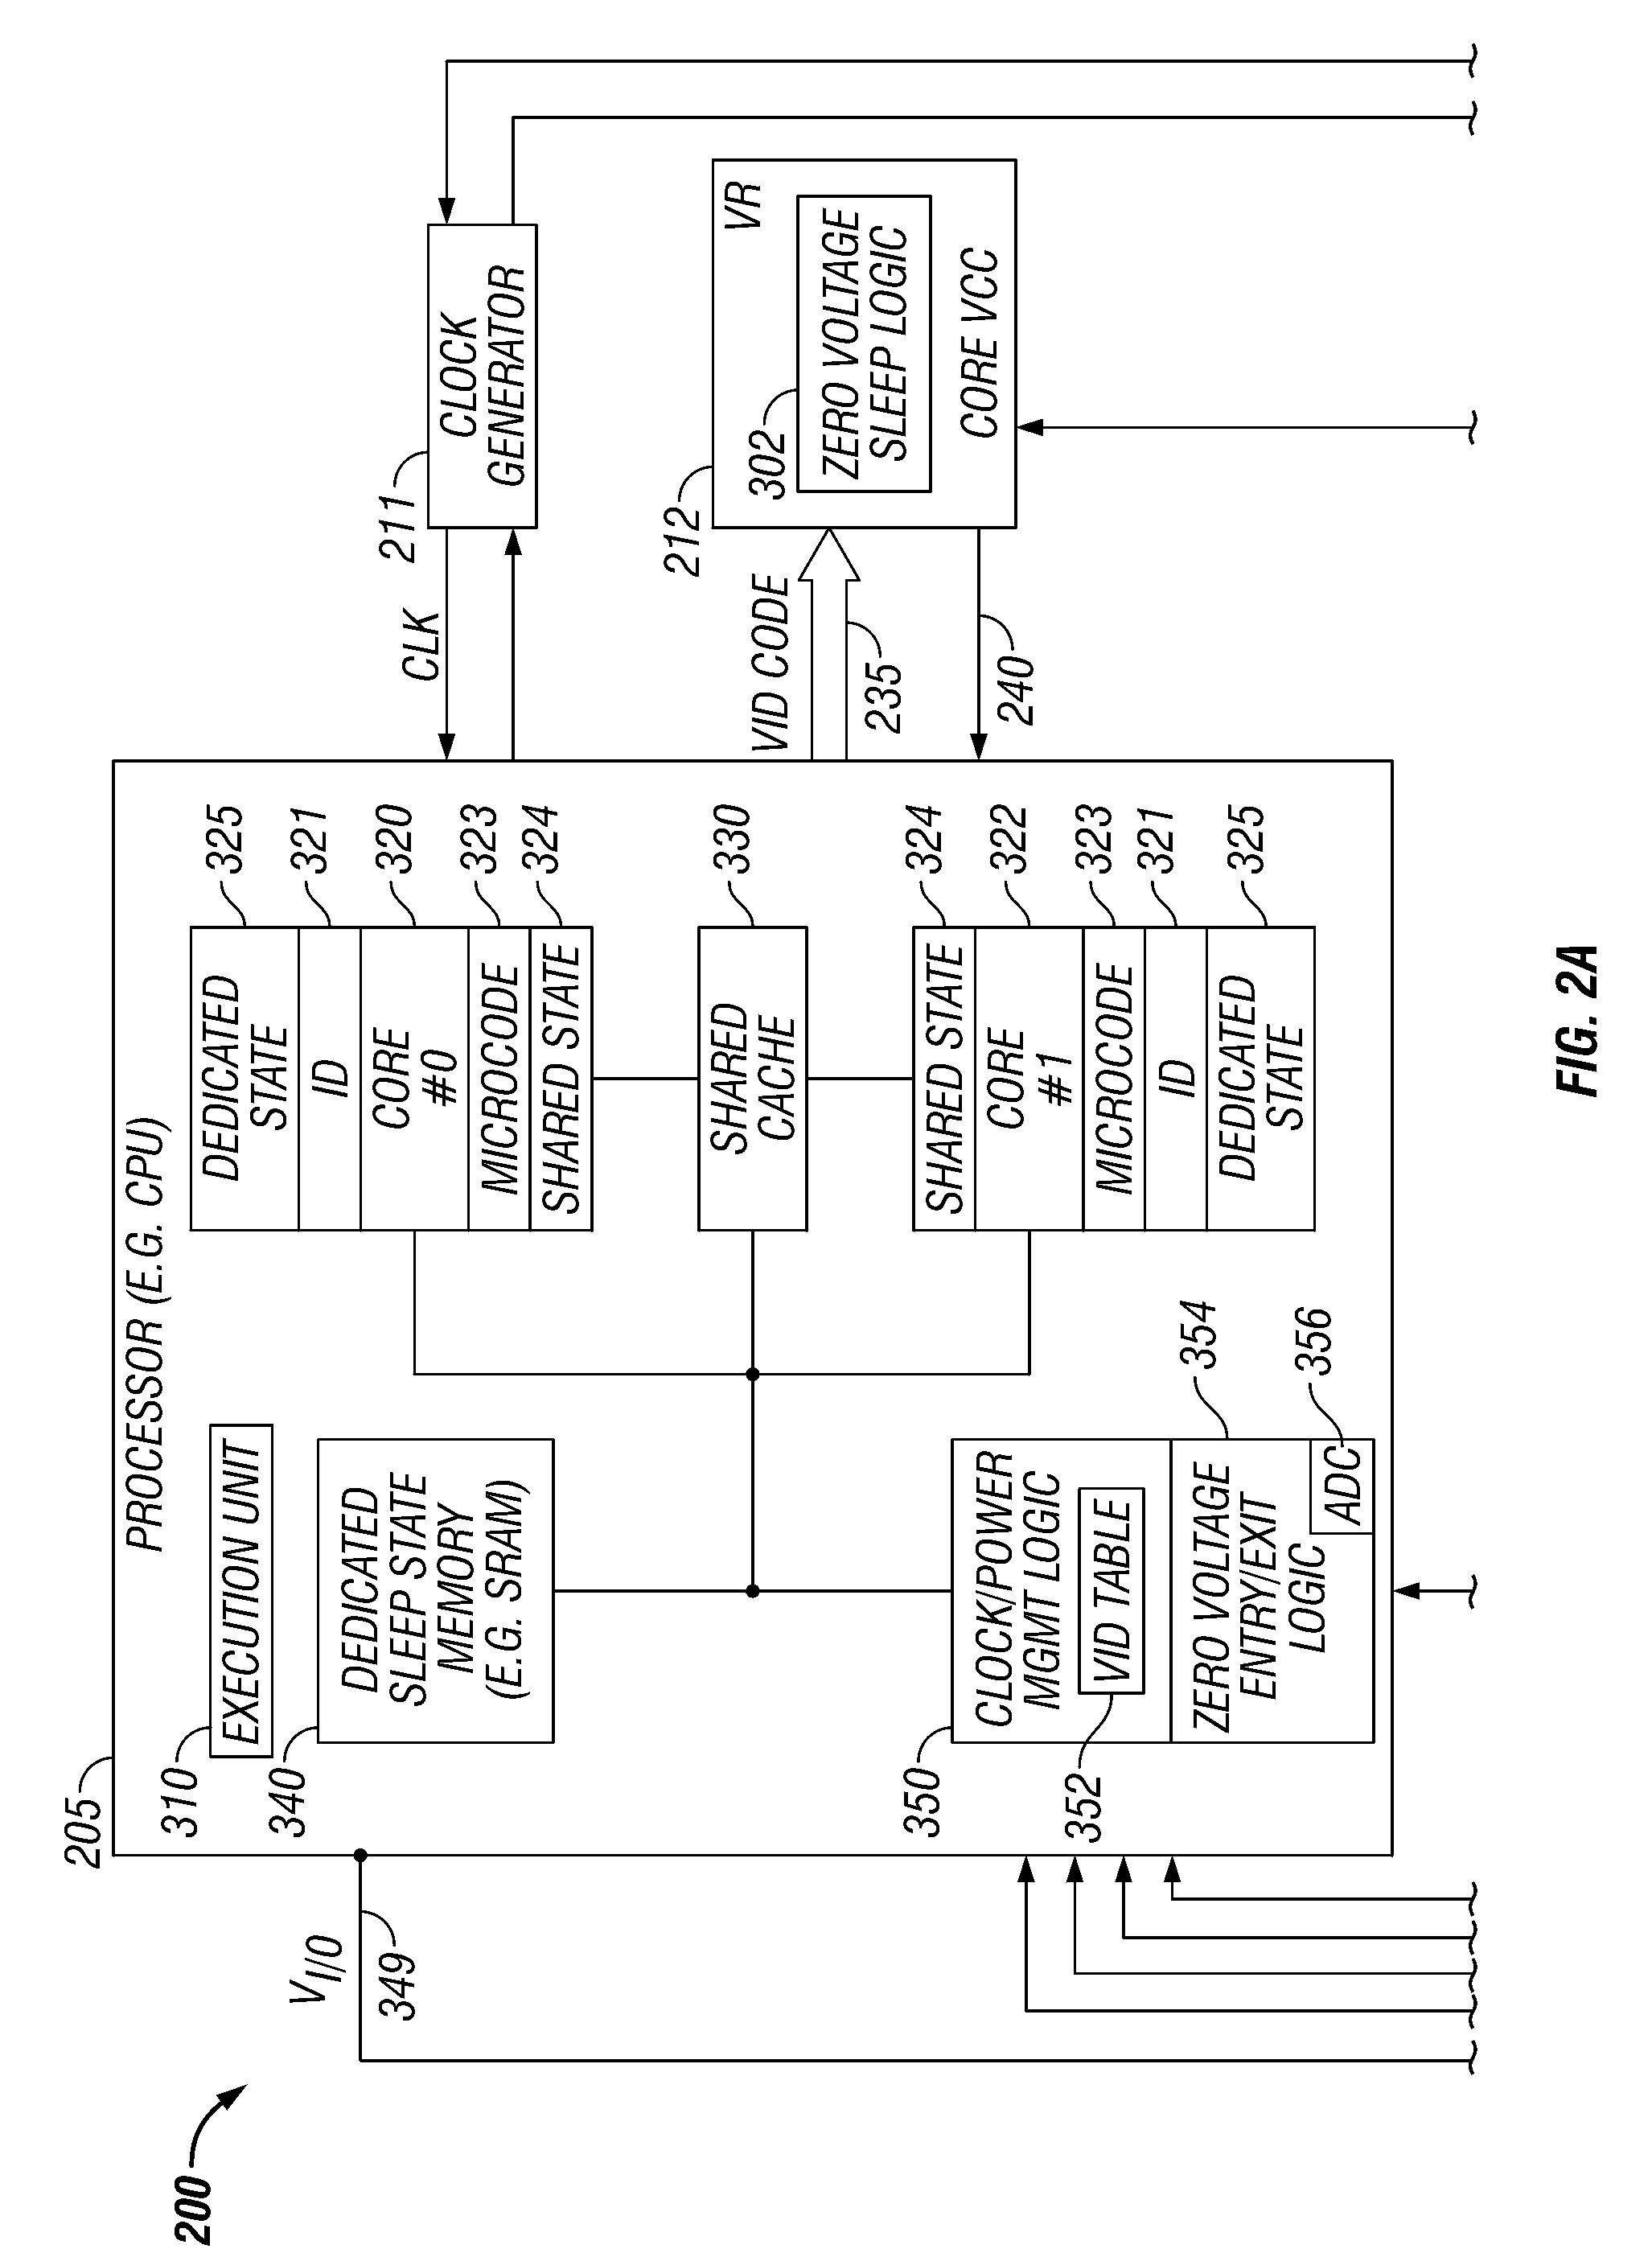 Patent US 9,223,389 B2